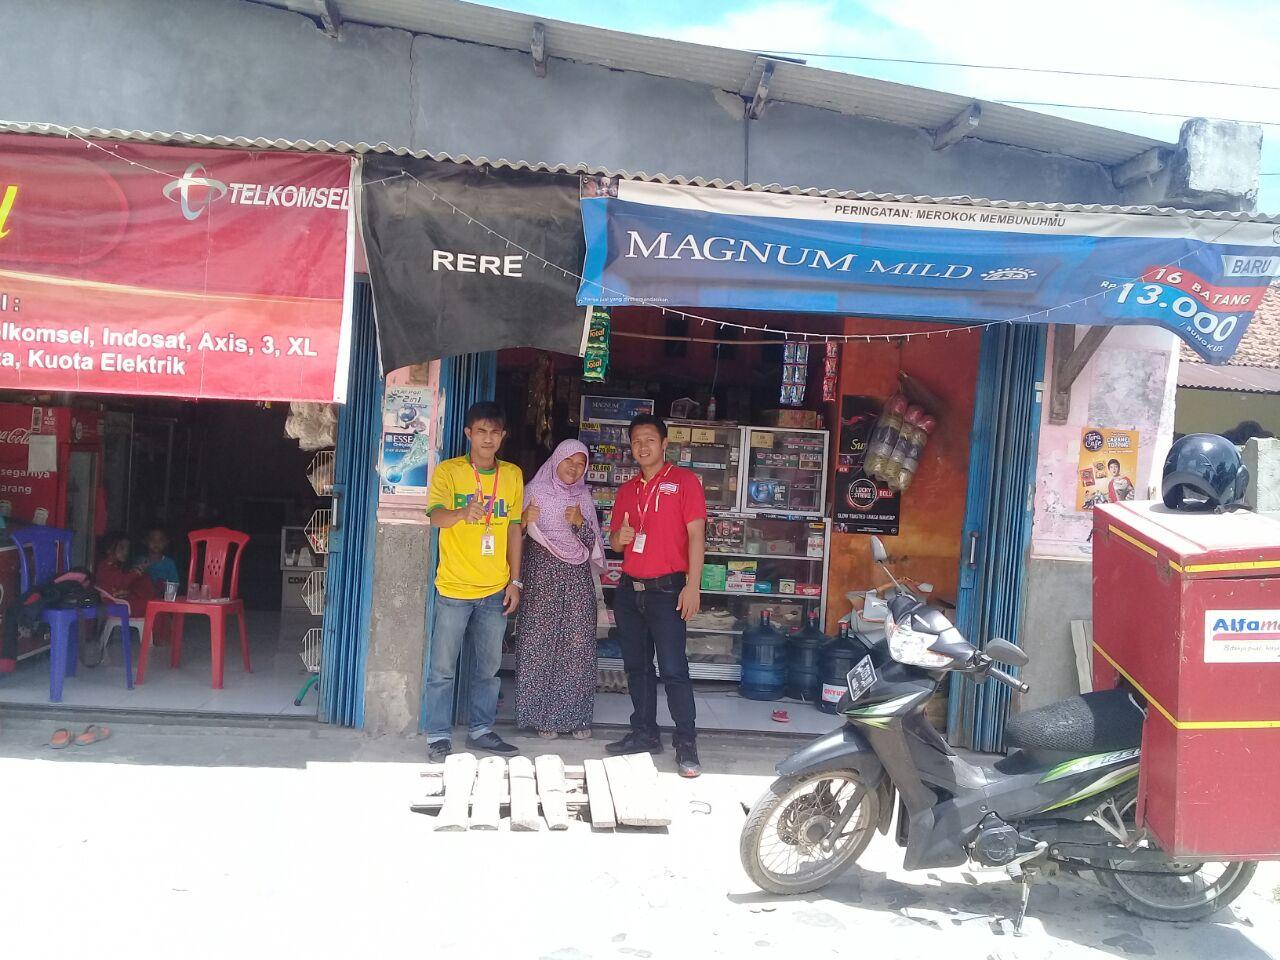 Rianto Jadi Pemenang Pedagang Alfamart Lampung